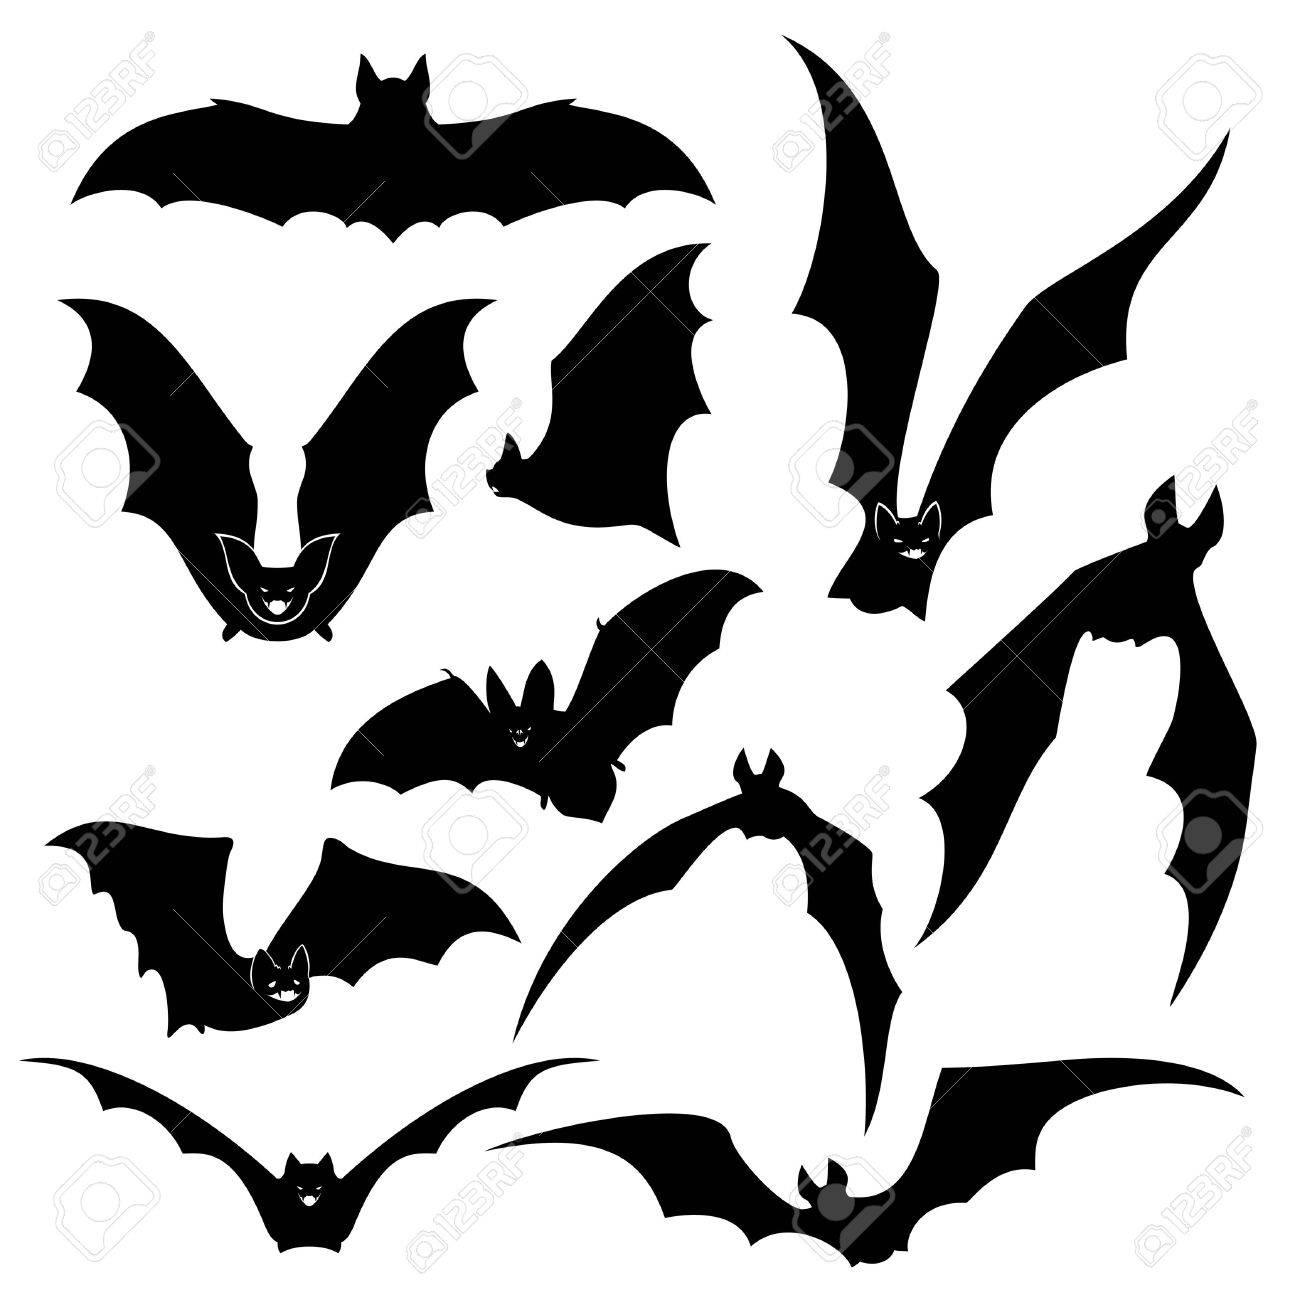 black bats silhouettes set wing and halloween vampire animal wildlife design illustration stock